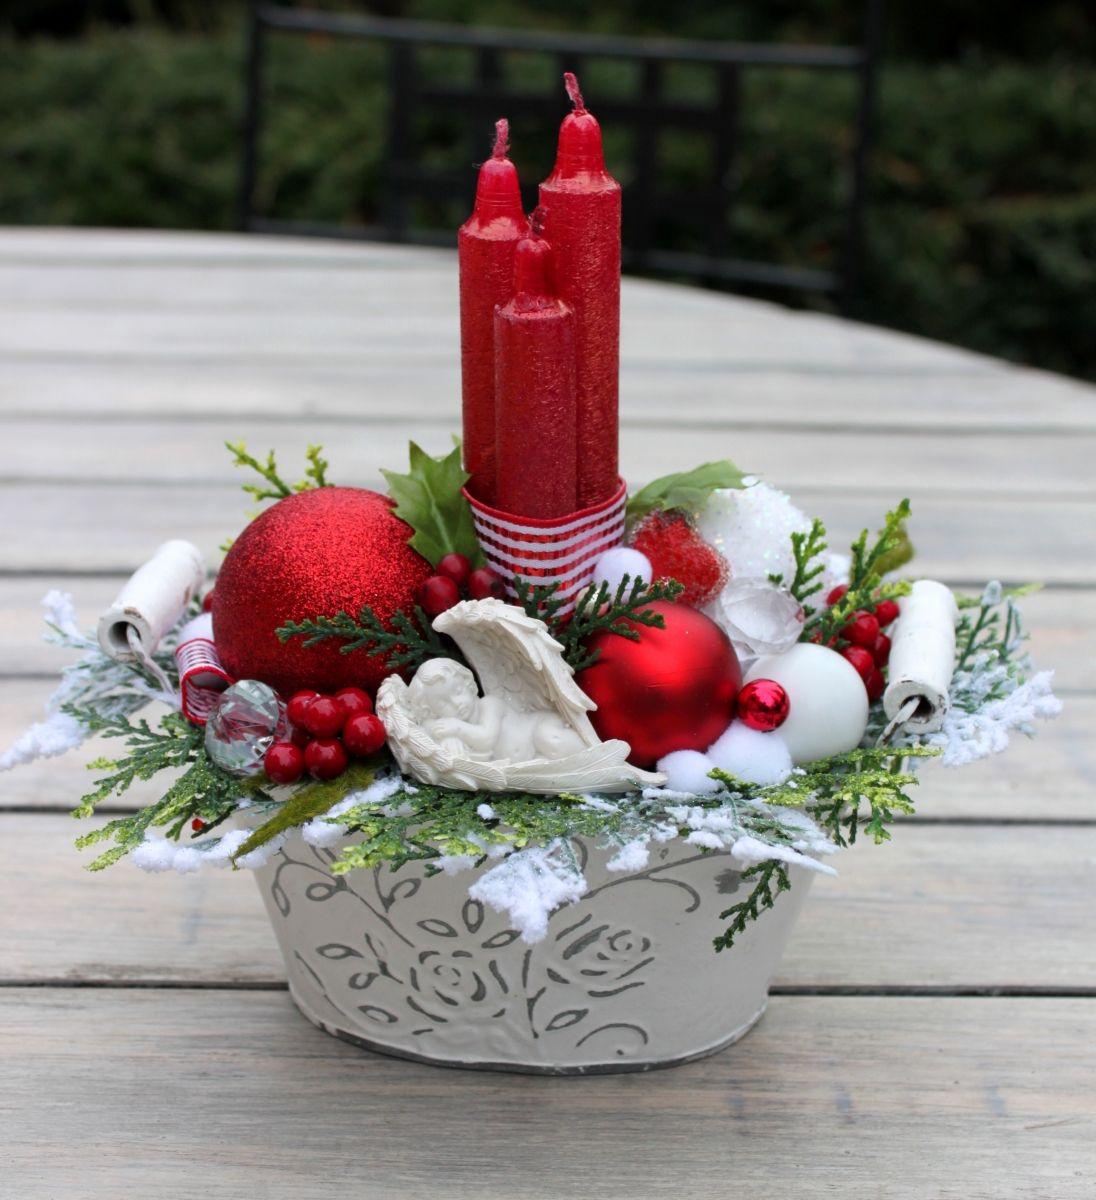 Vysledek Obrazku Pro Stroiki Na Boze Narodzenie W Doniczce Christmas Candle Decorations Christmas Centerpieces Christmas Decorations